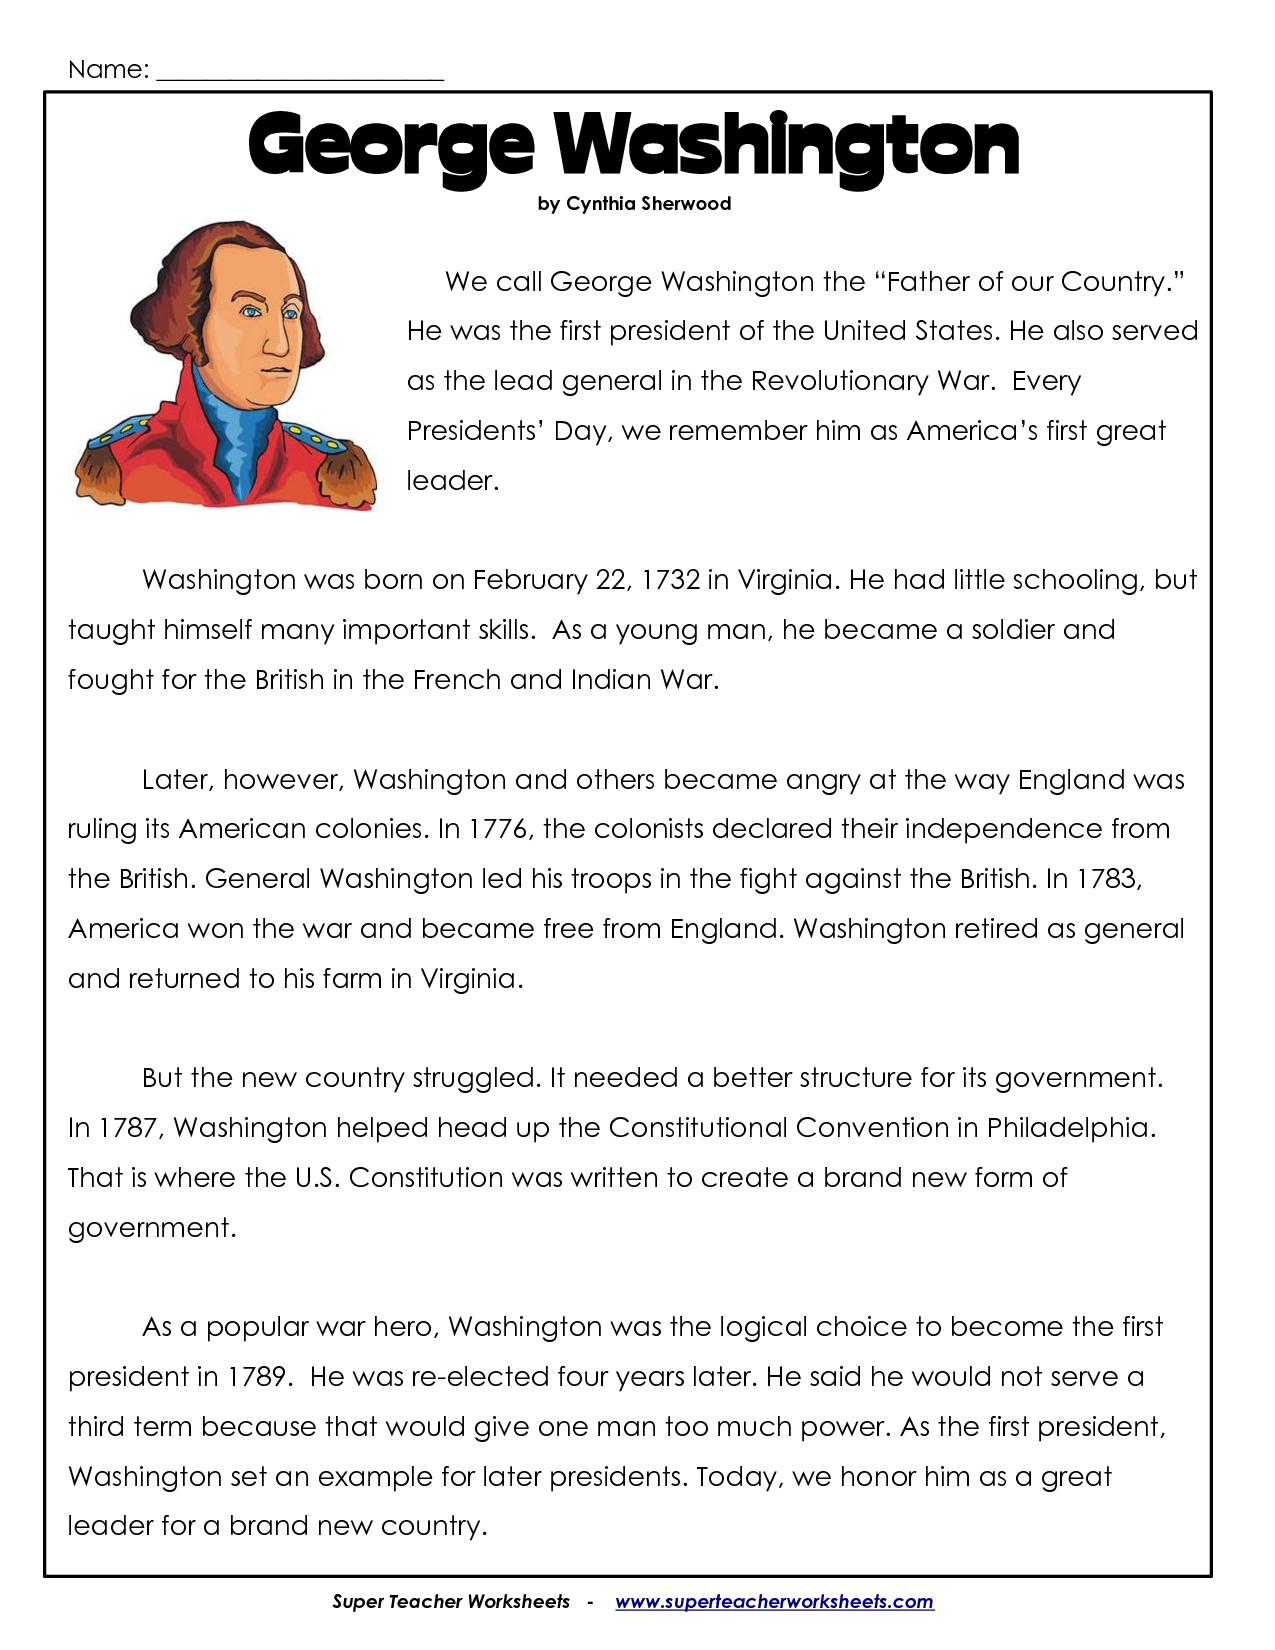 President's Day Coloring Worksheet | George Washington Worksheets | Free Printable George Washington Worksheets